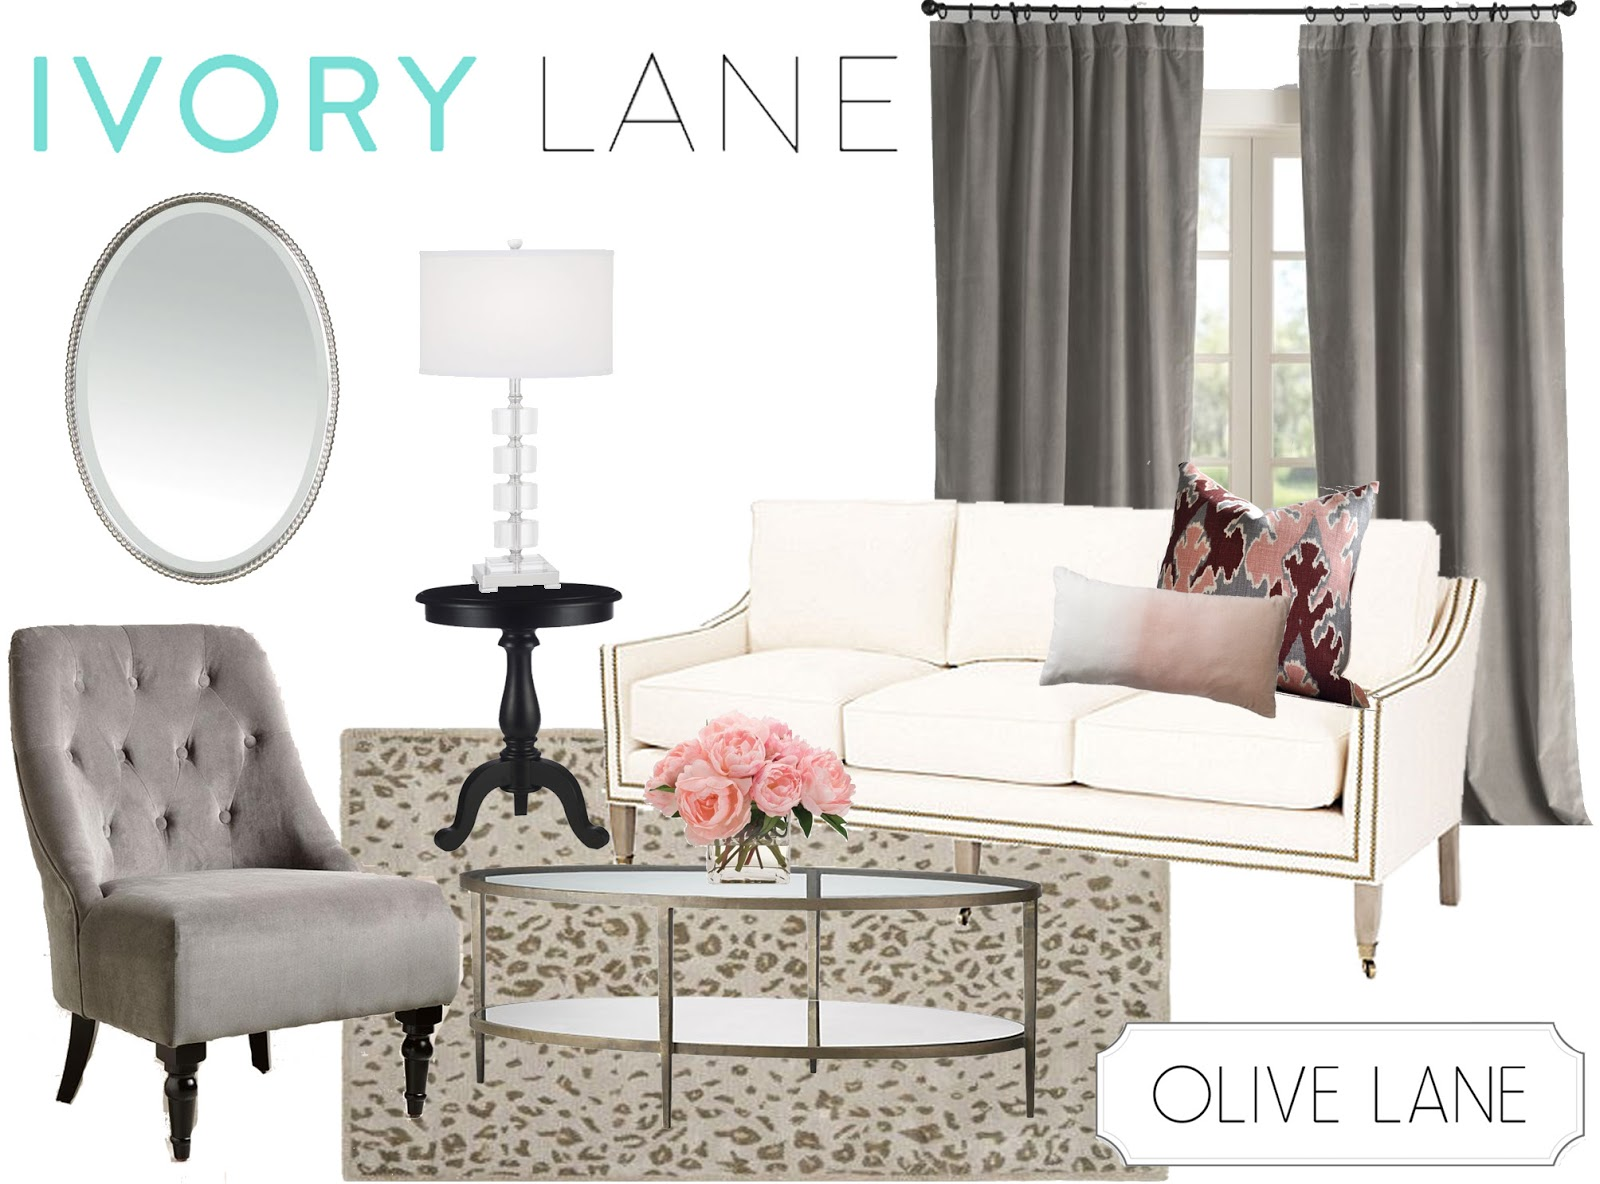 Ballard Designs Sectional Sofa : ballard designs sectional sofa - Sectionals, Sofas & Couches